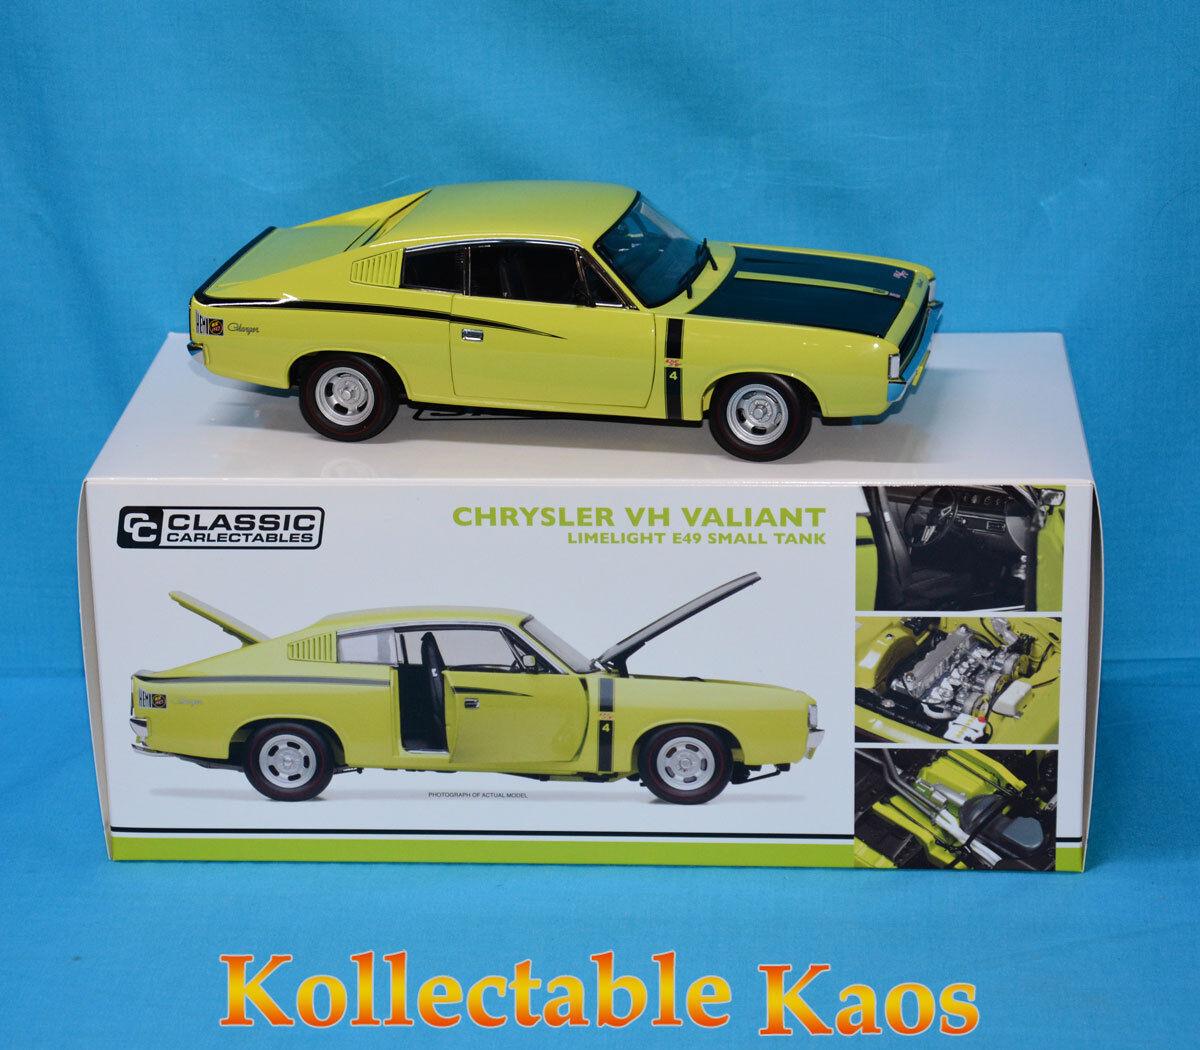 tienda de venta 1 18 18 18 Classics-Chrysler VH Valiente-E49 pequeñas Tanque-Limelight  muy popular